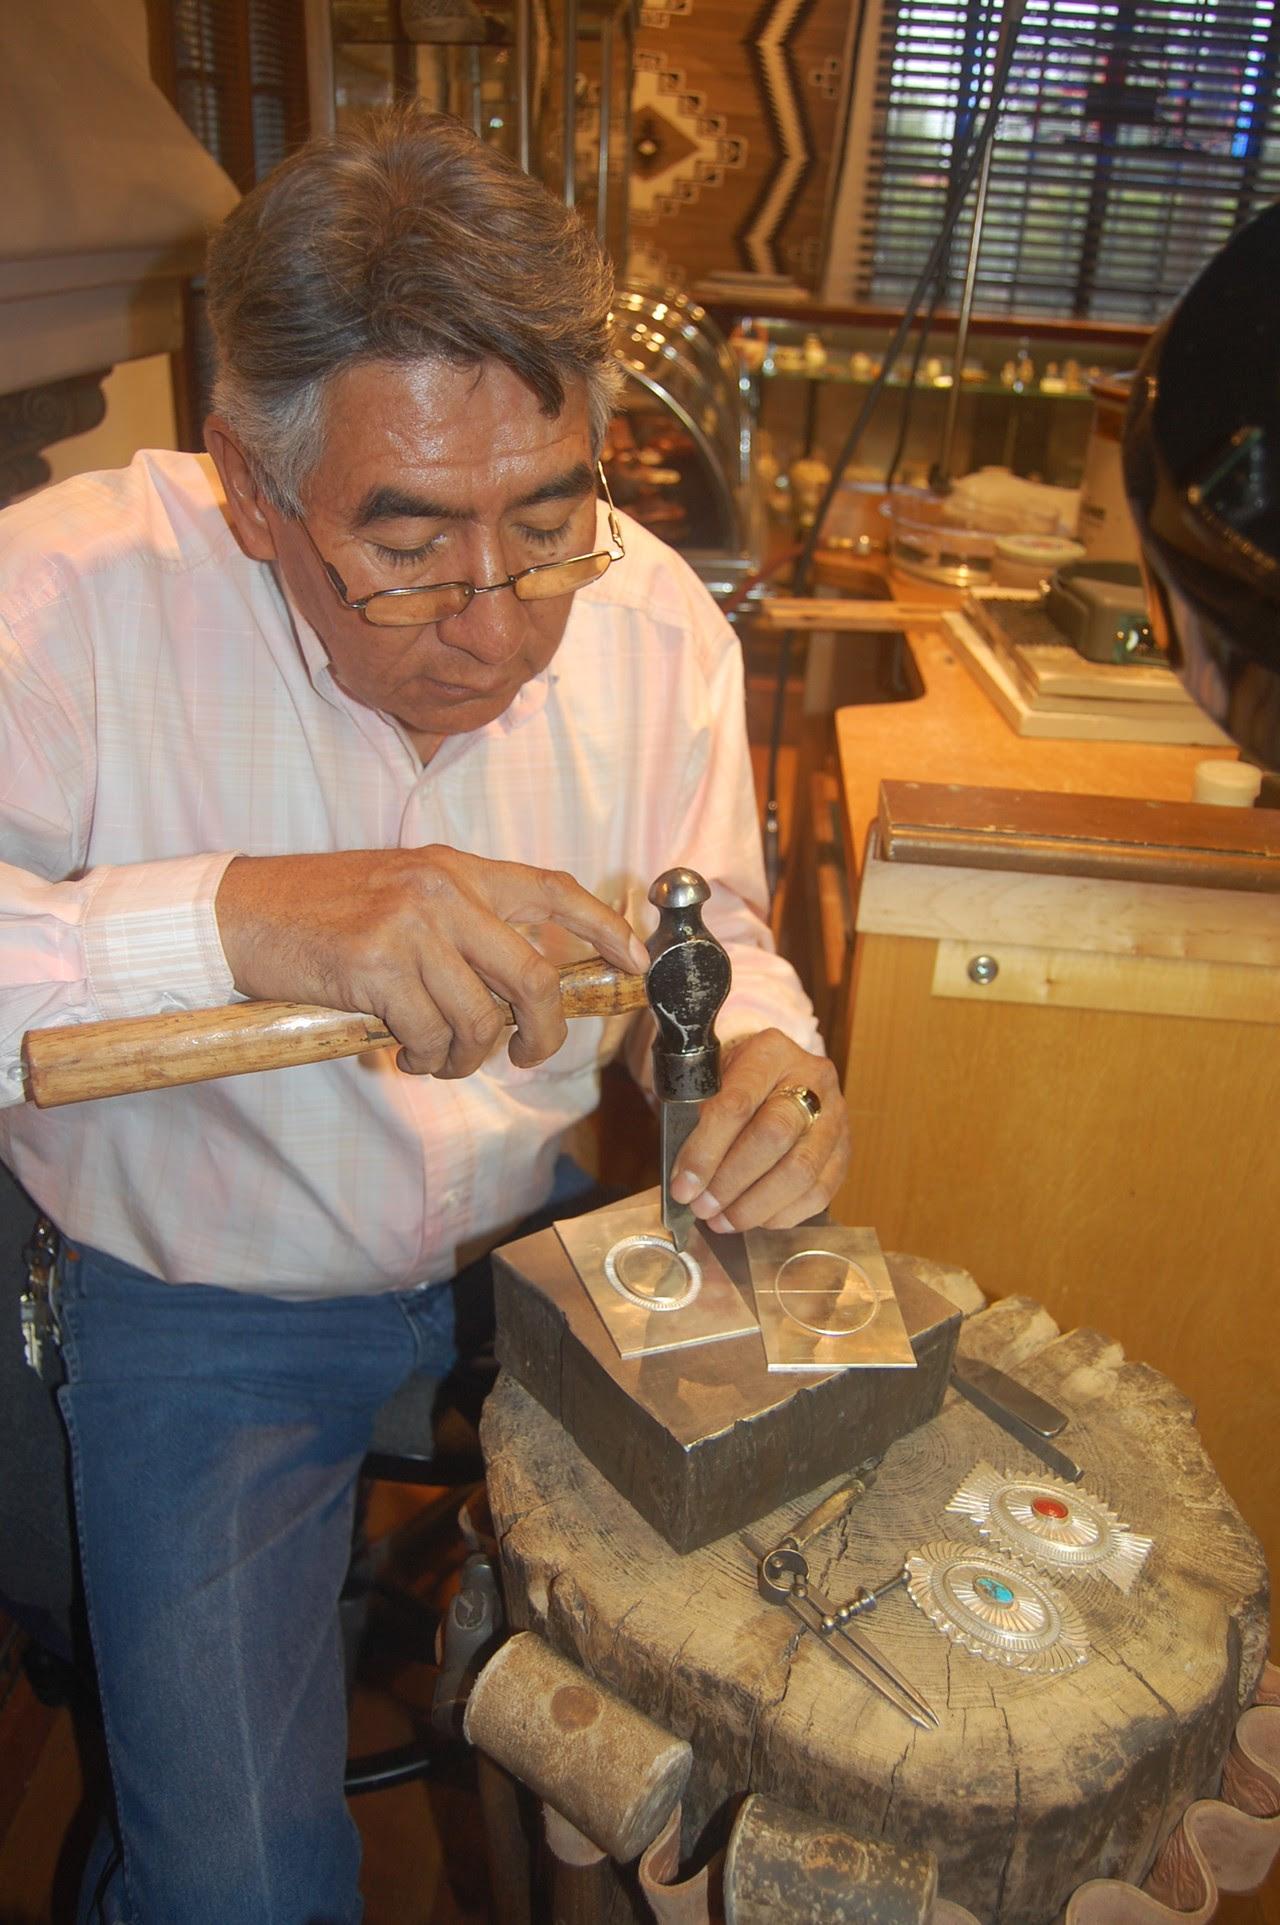 http://media1.fdncms.com/tucsonweekly/imager/wilson-jim-navajo-silversmith/u/zoom/3229878/silver_buckles.jpg